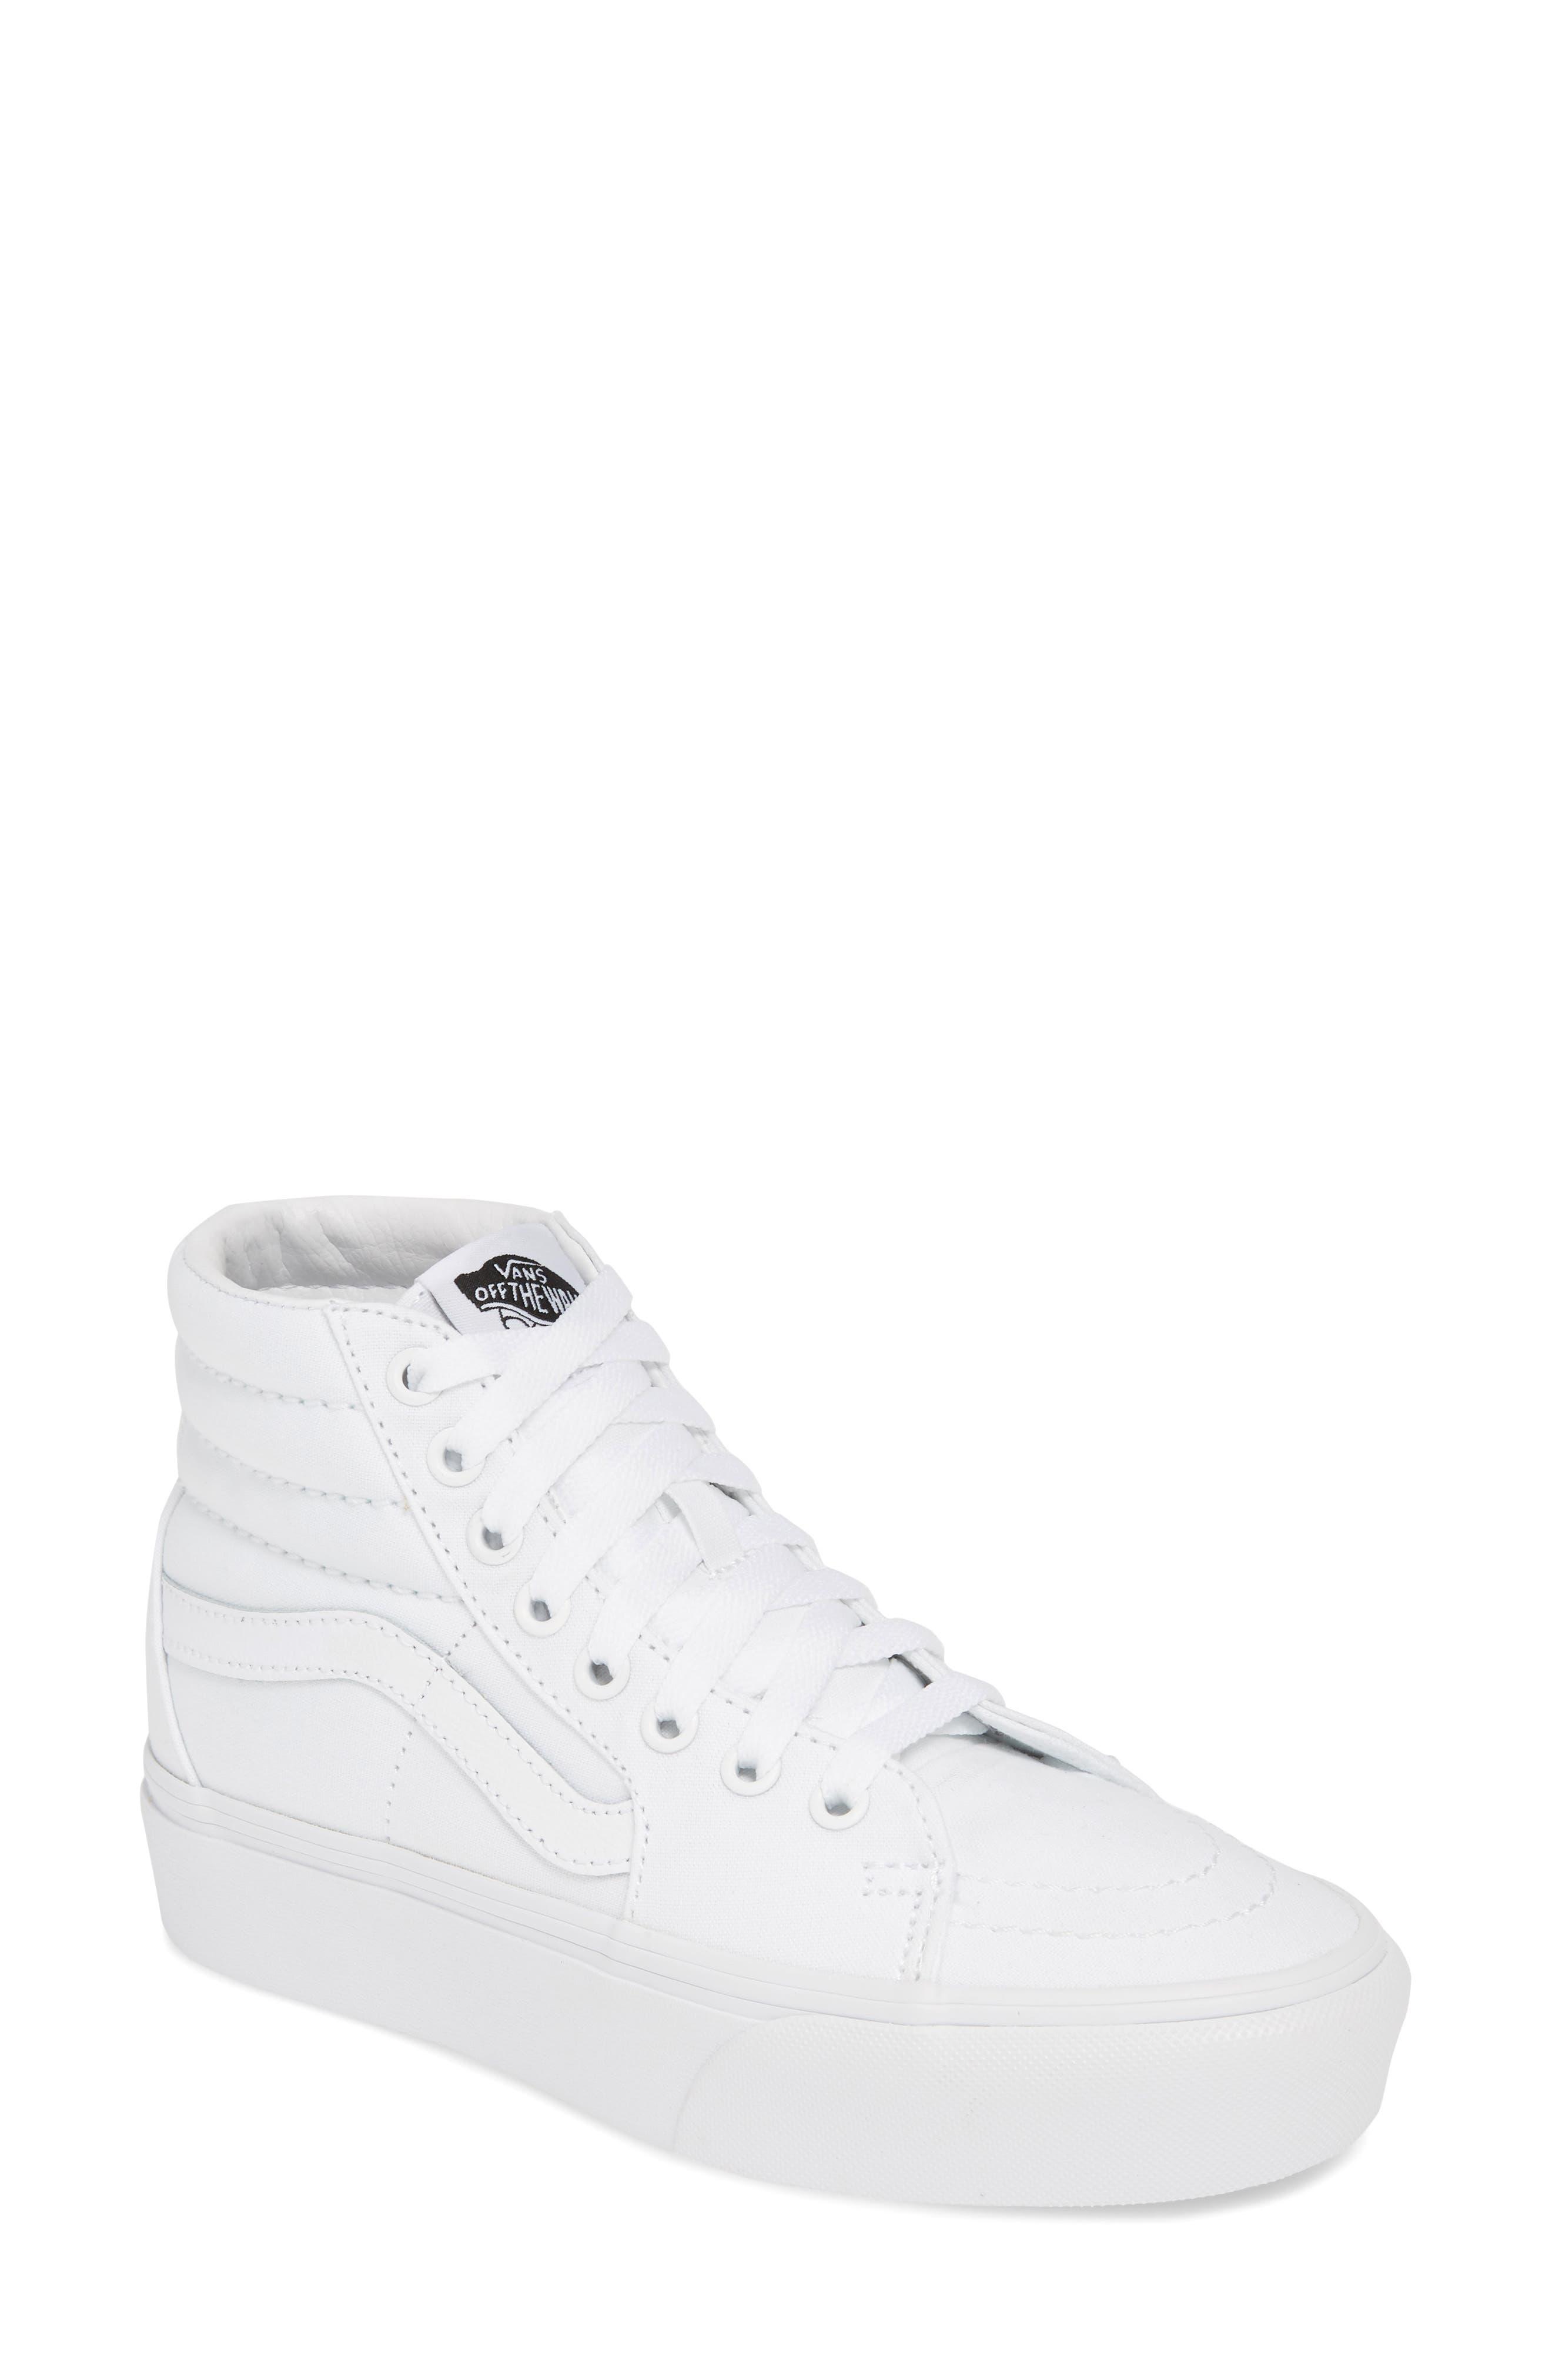 d7007fa750 Vans High Tops  High-Top Sneakers for Women